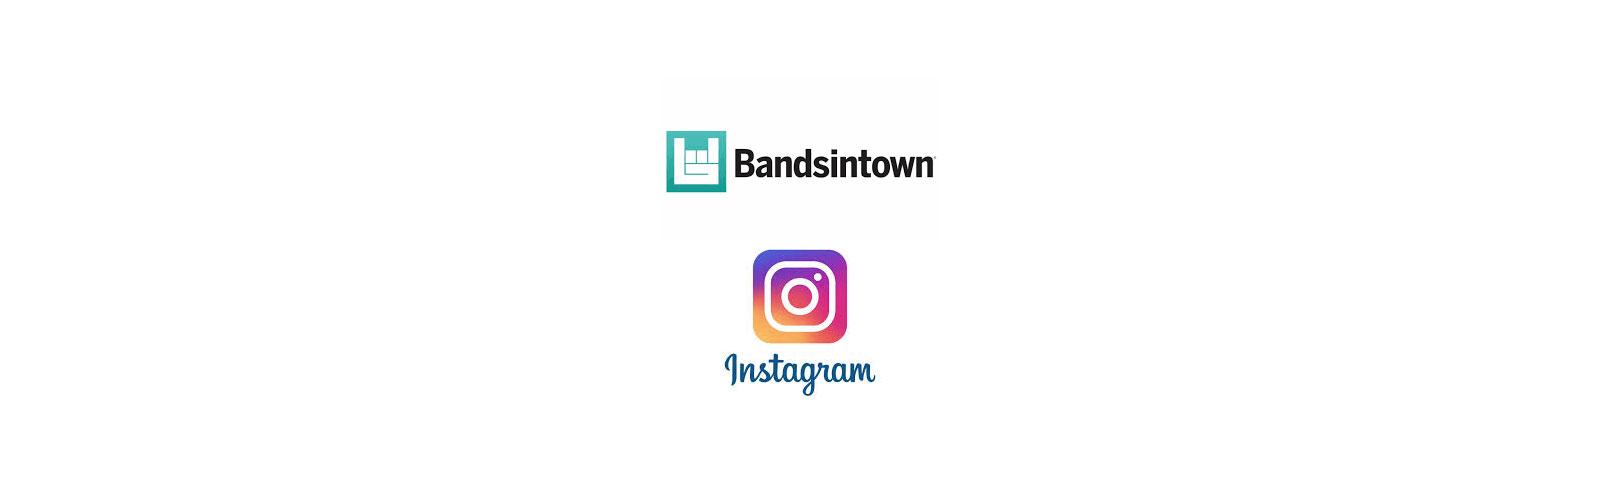 bandsintown-instagram